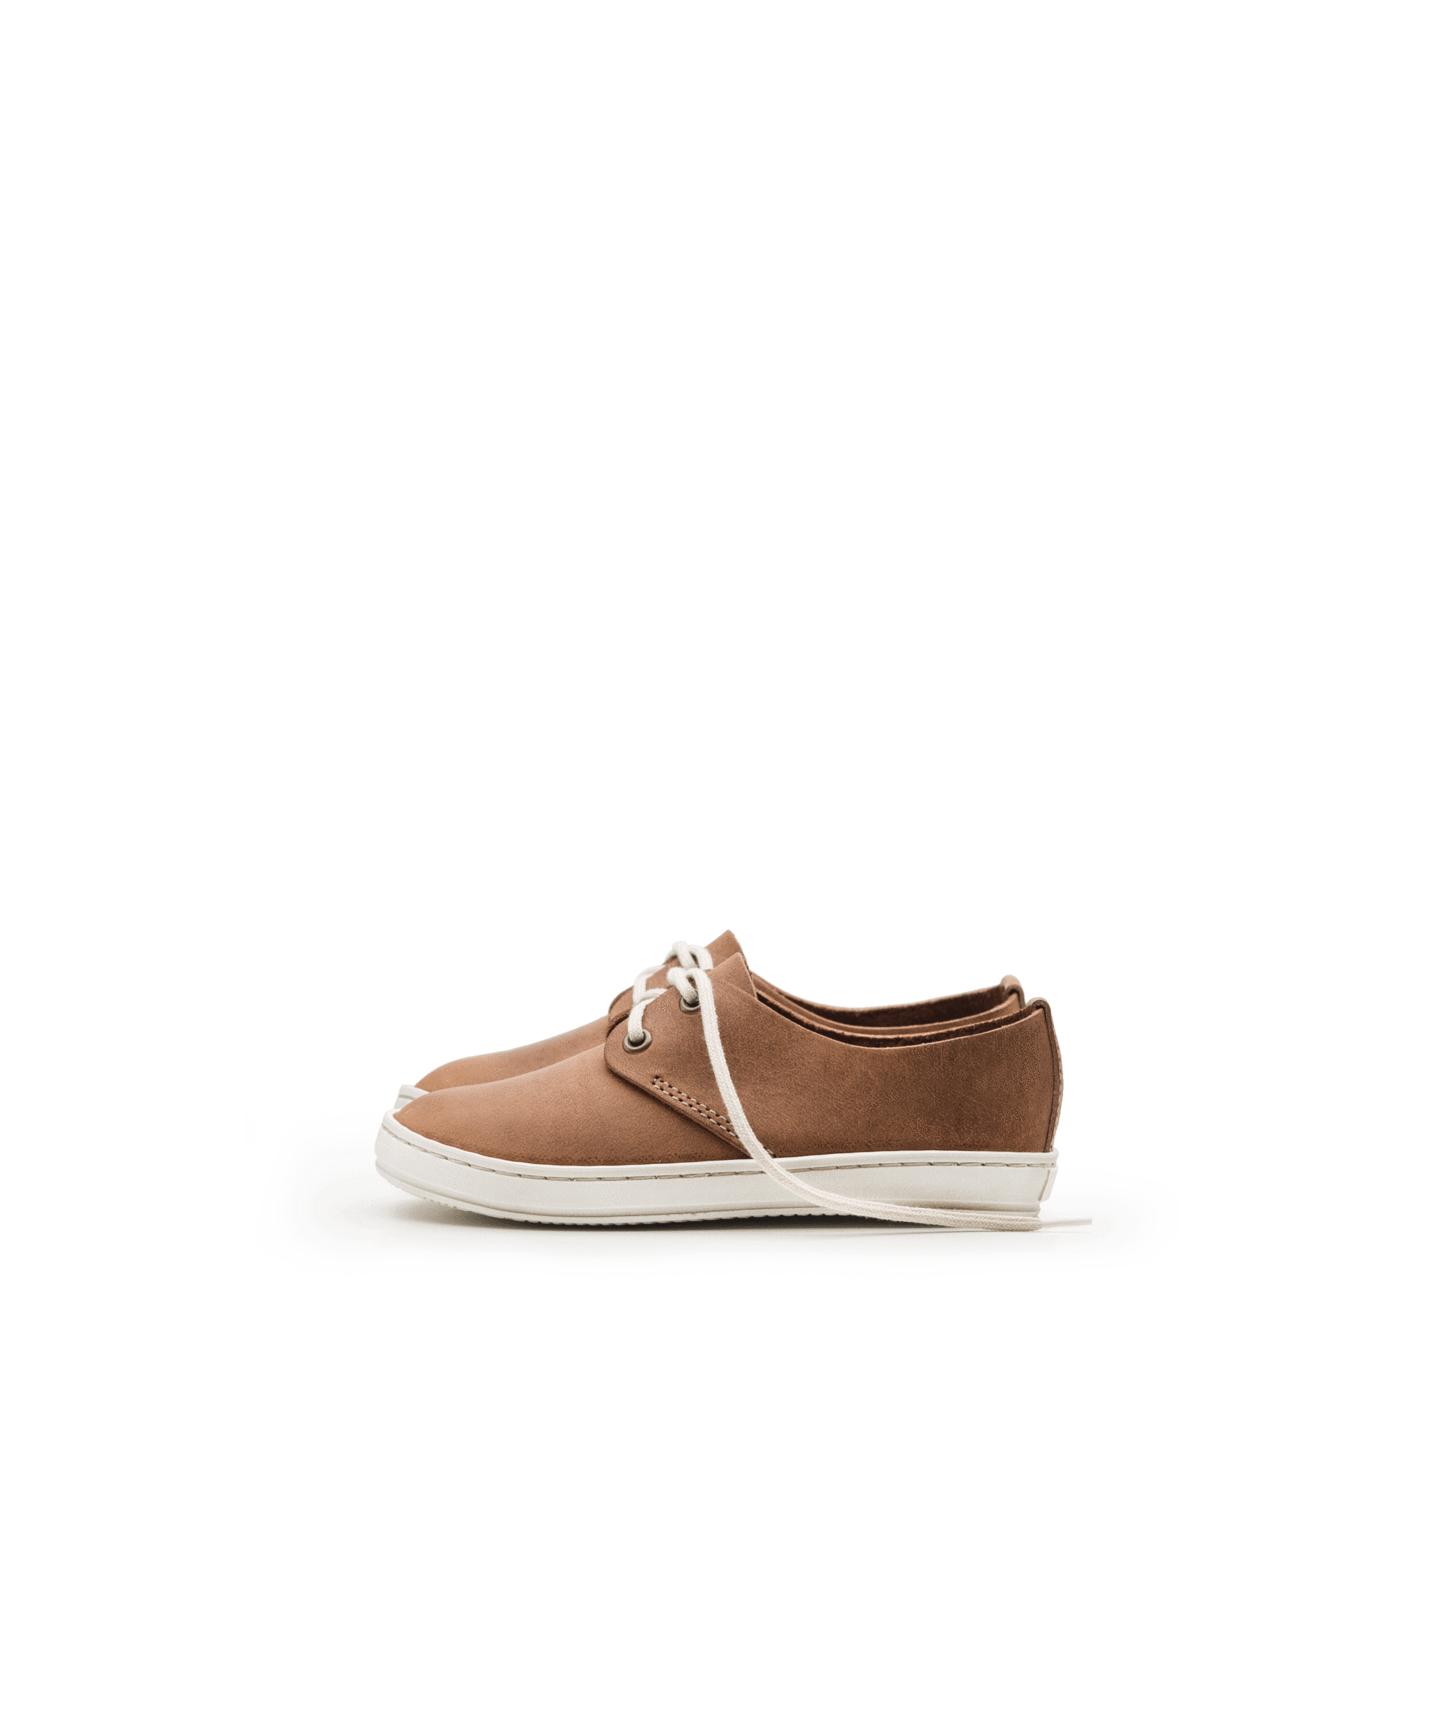 ring bearer shoes tan sneakers